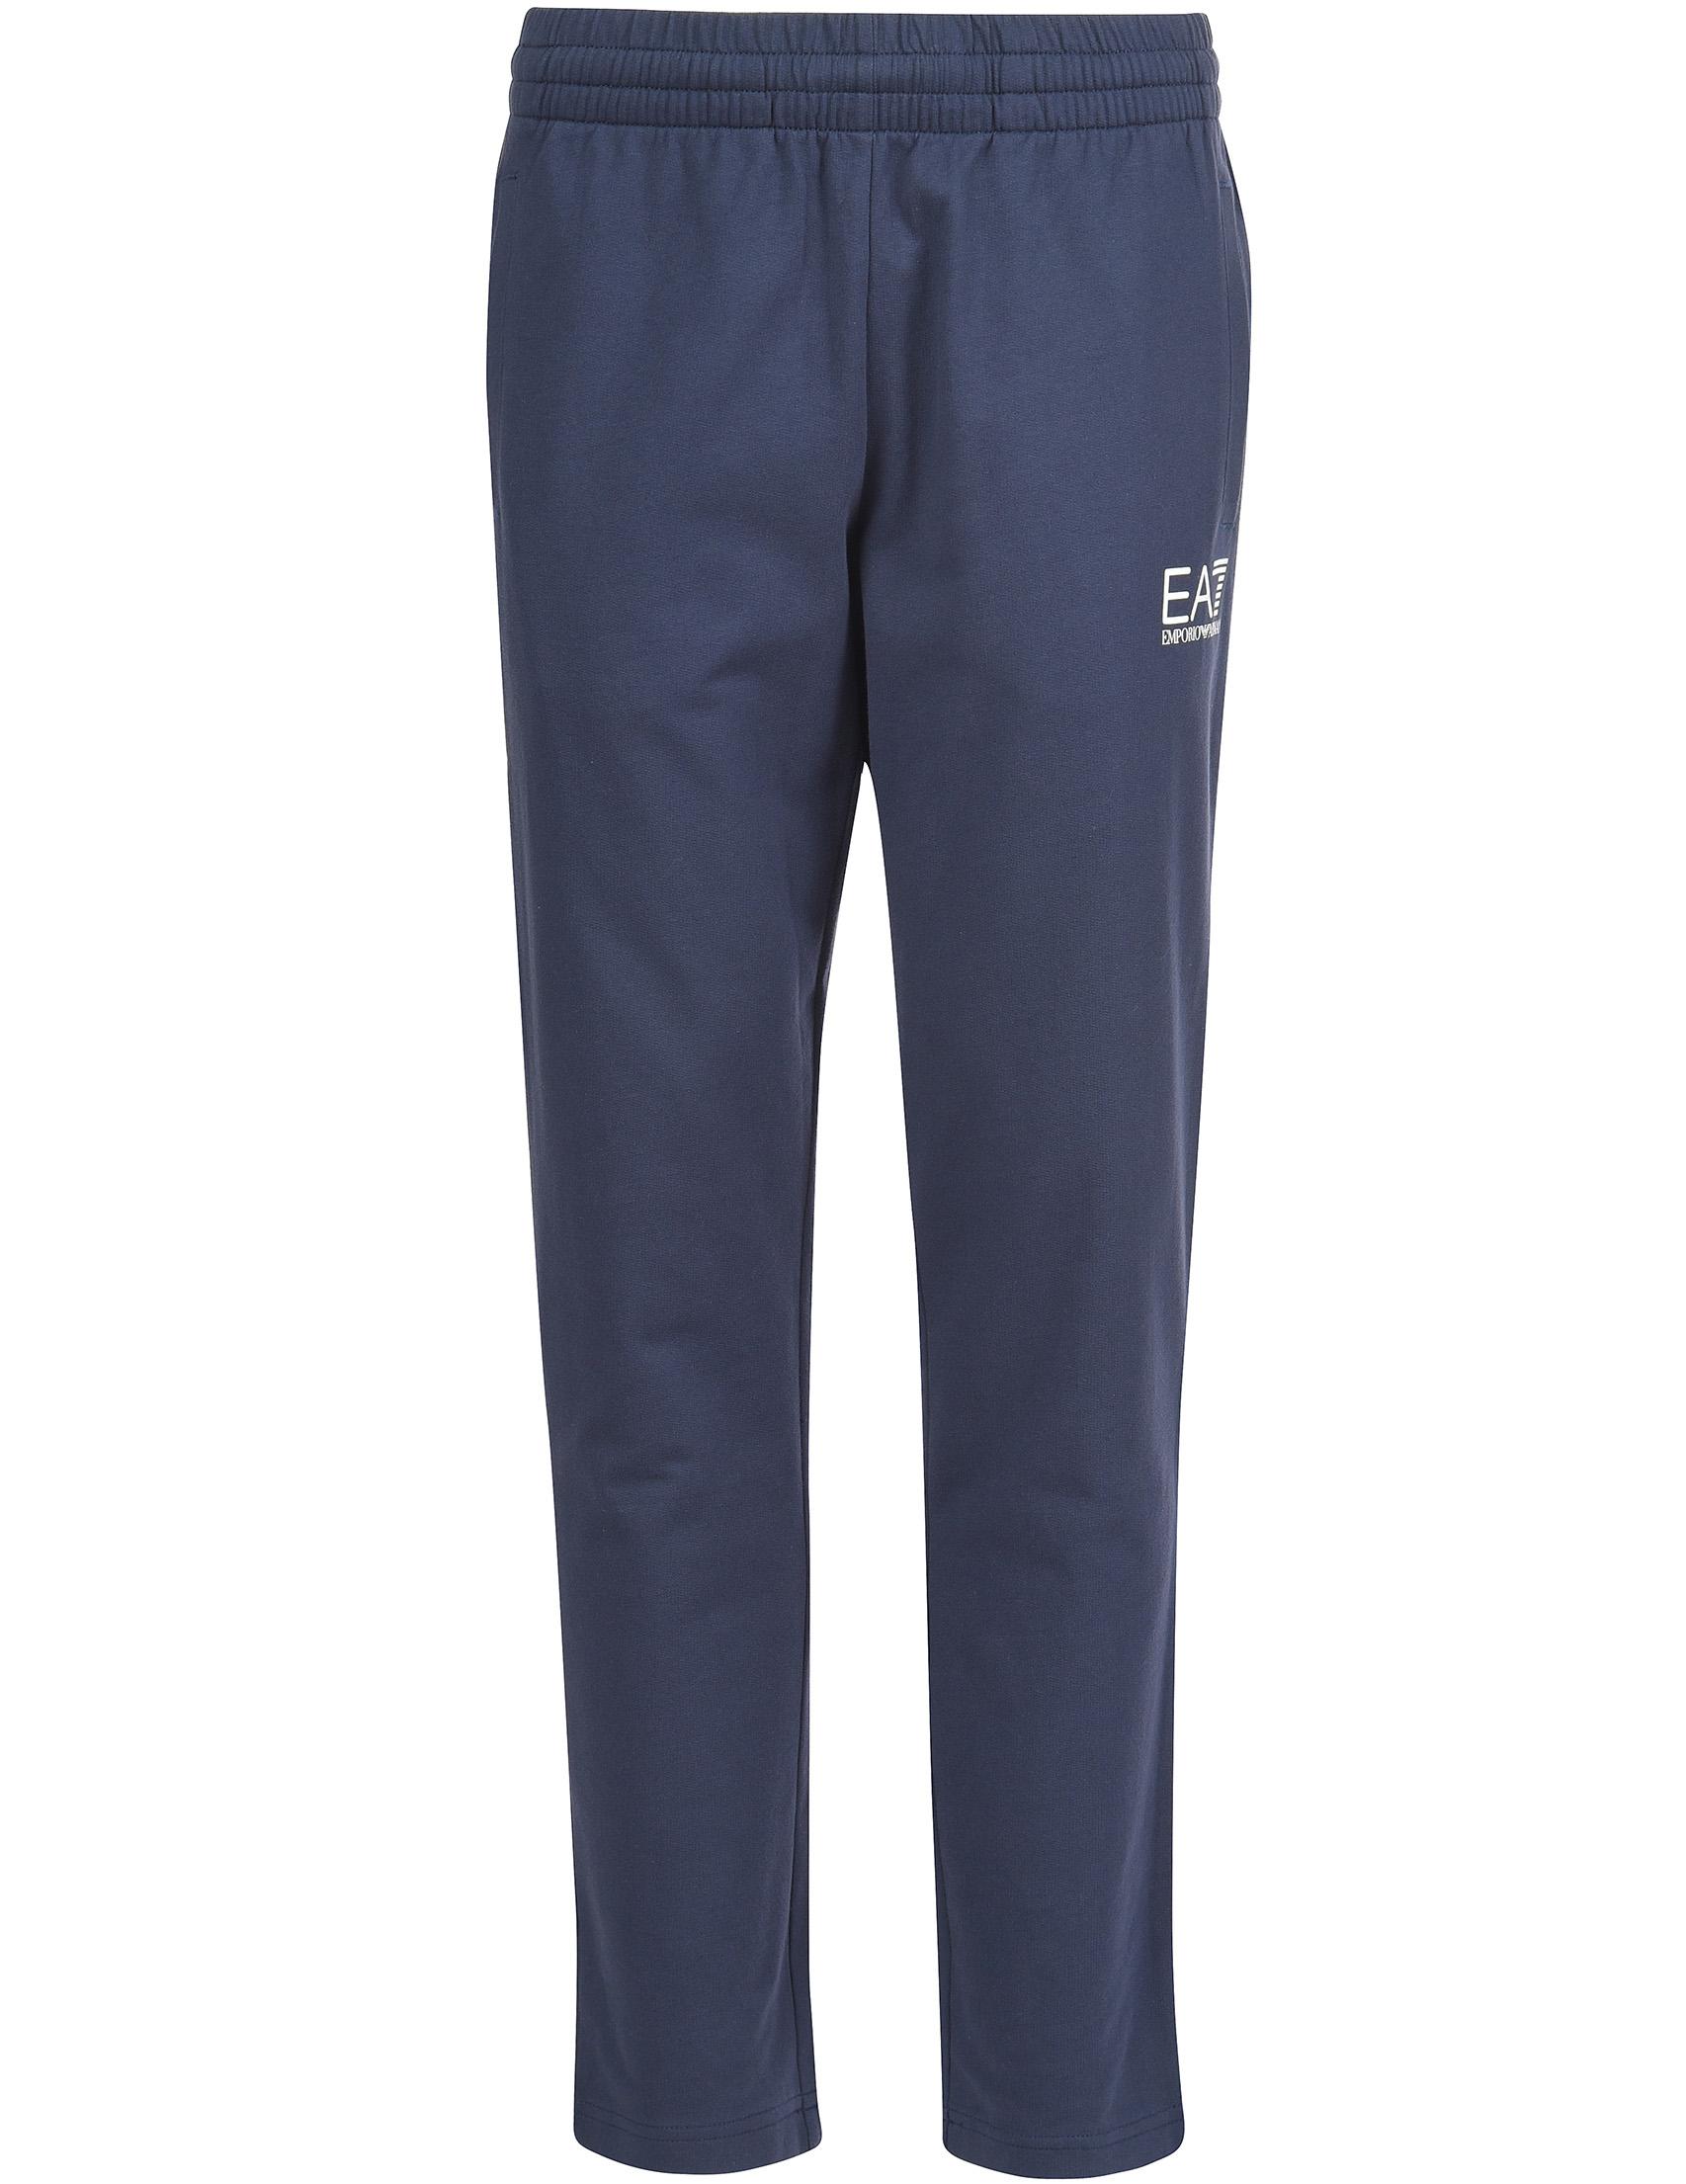 Мужские спортивные брюки EA7 EMPORIO ARMANI 6ZPP51-PJ05Z-1554_blue